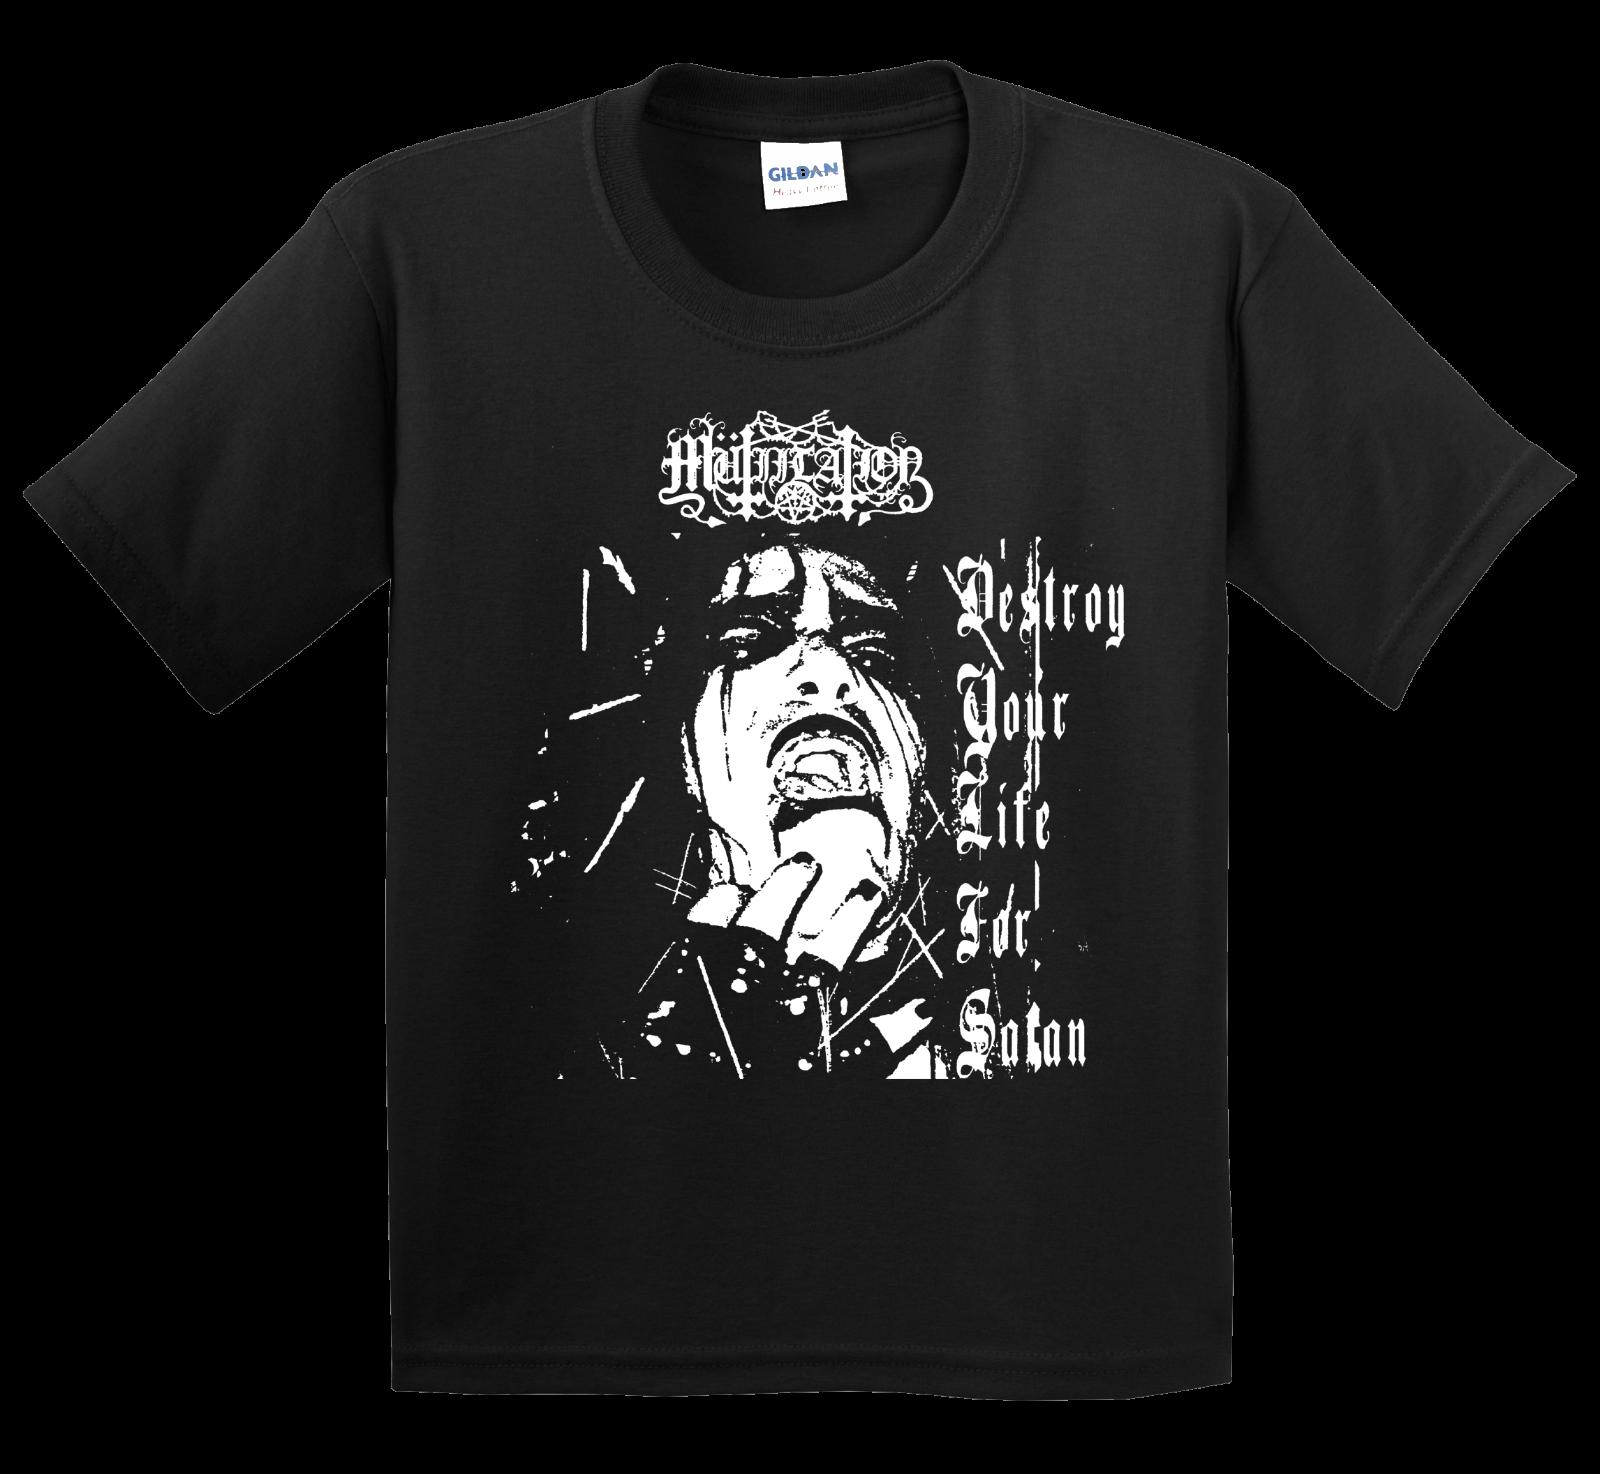 Mutiilation Destroy Your Life for Satan T Shirt Black Metal Death Vlad Tepes Von Printed T-Shirt Short Sleeve Men Top Tee